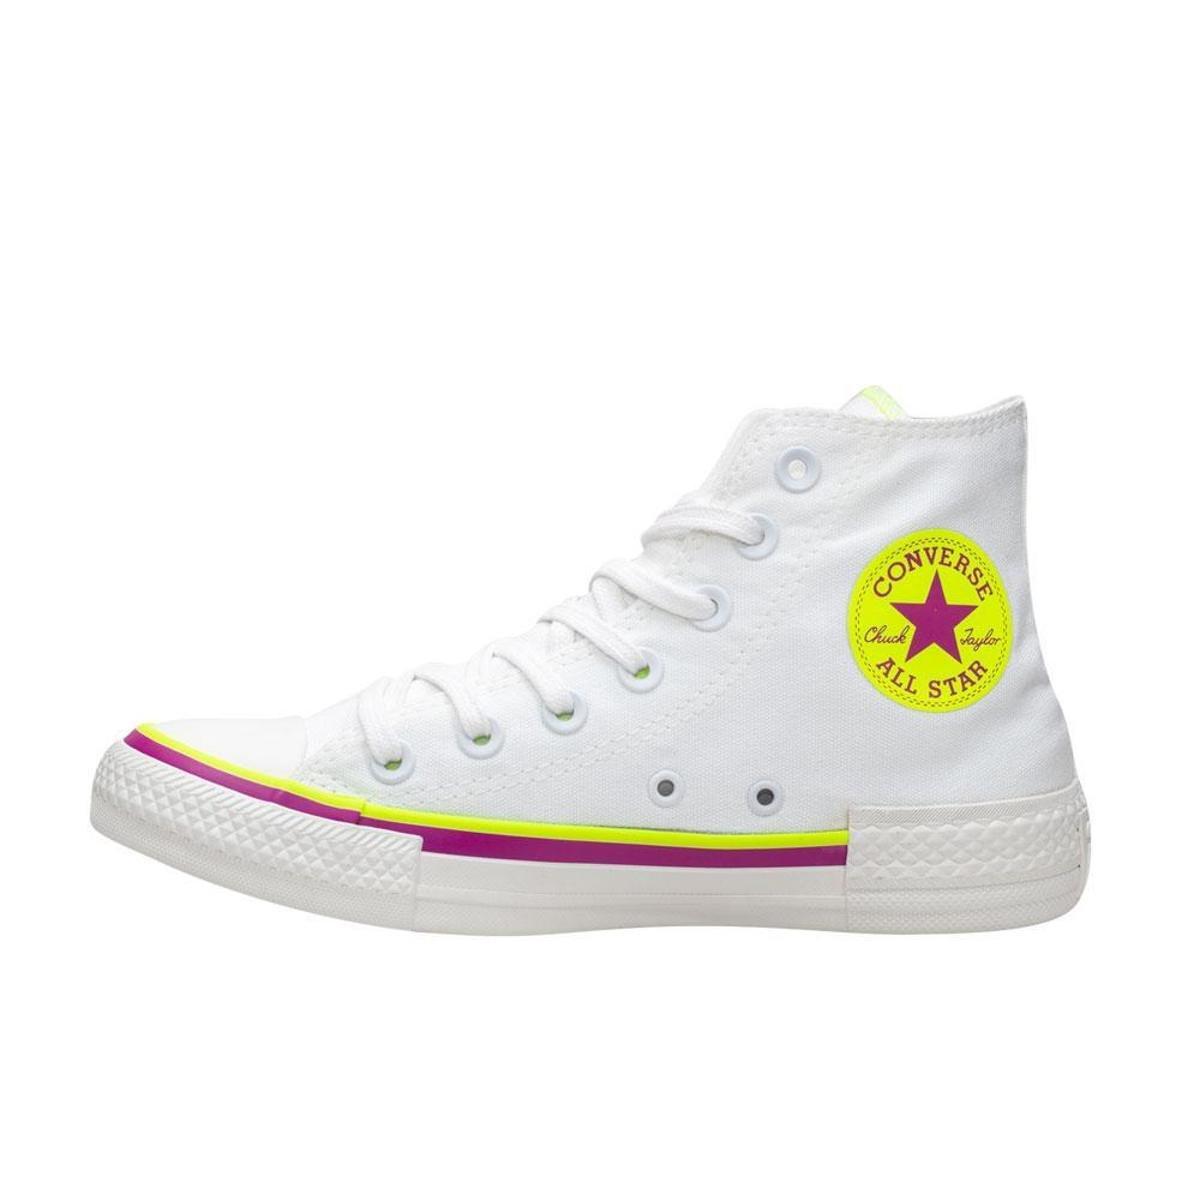 Tênis Converse Chuck Taylor All Star Cano Alto - Branco